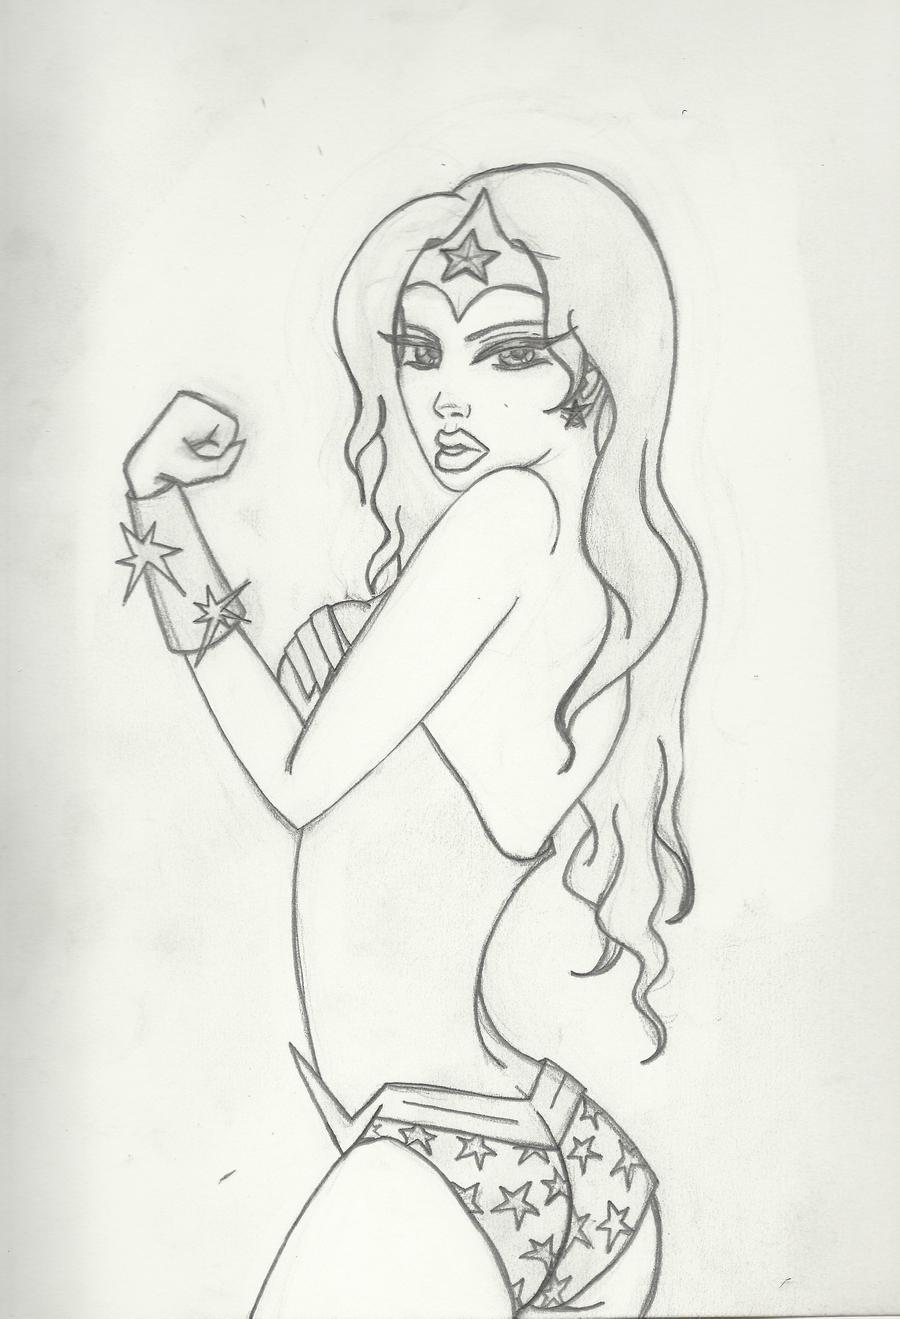 Animeish Wonder Woman Sketch by Winged-warrior